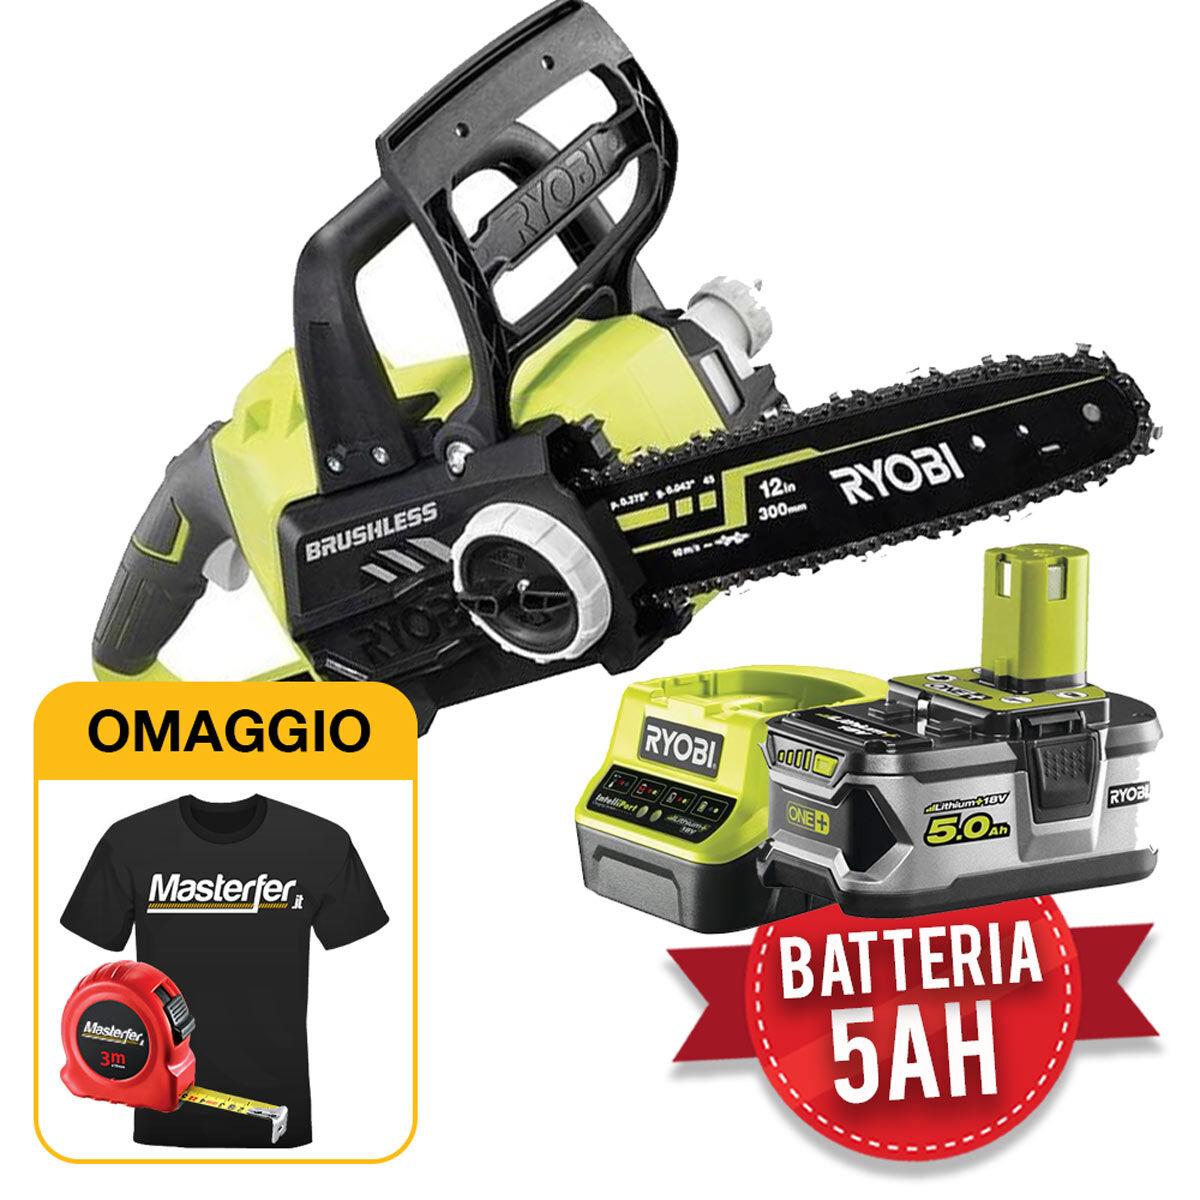 ryobi rcs18x3050f - elettrosega a batteria e motore brushless one+ 18v 1x5.0ah